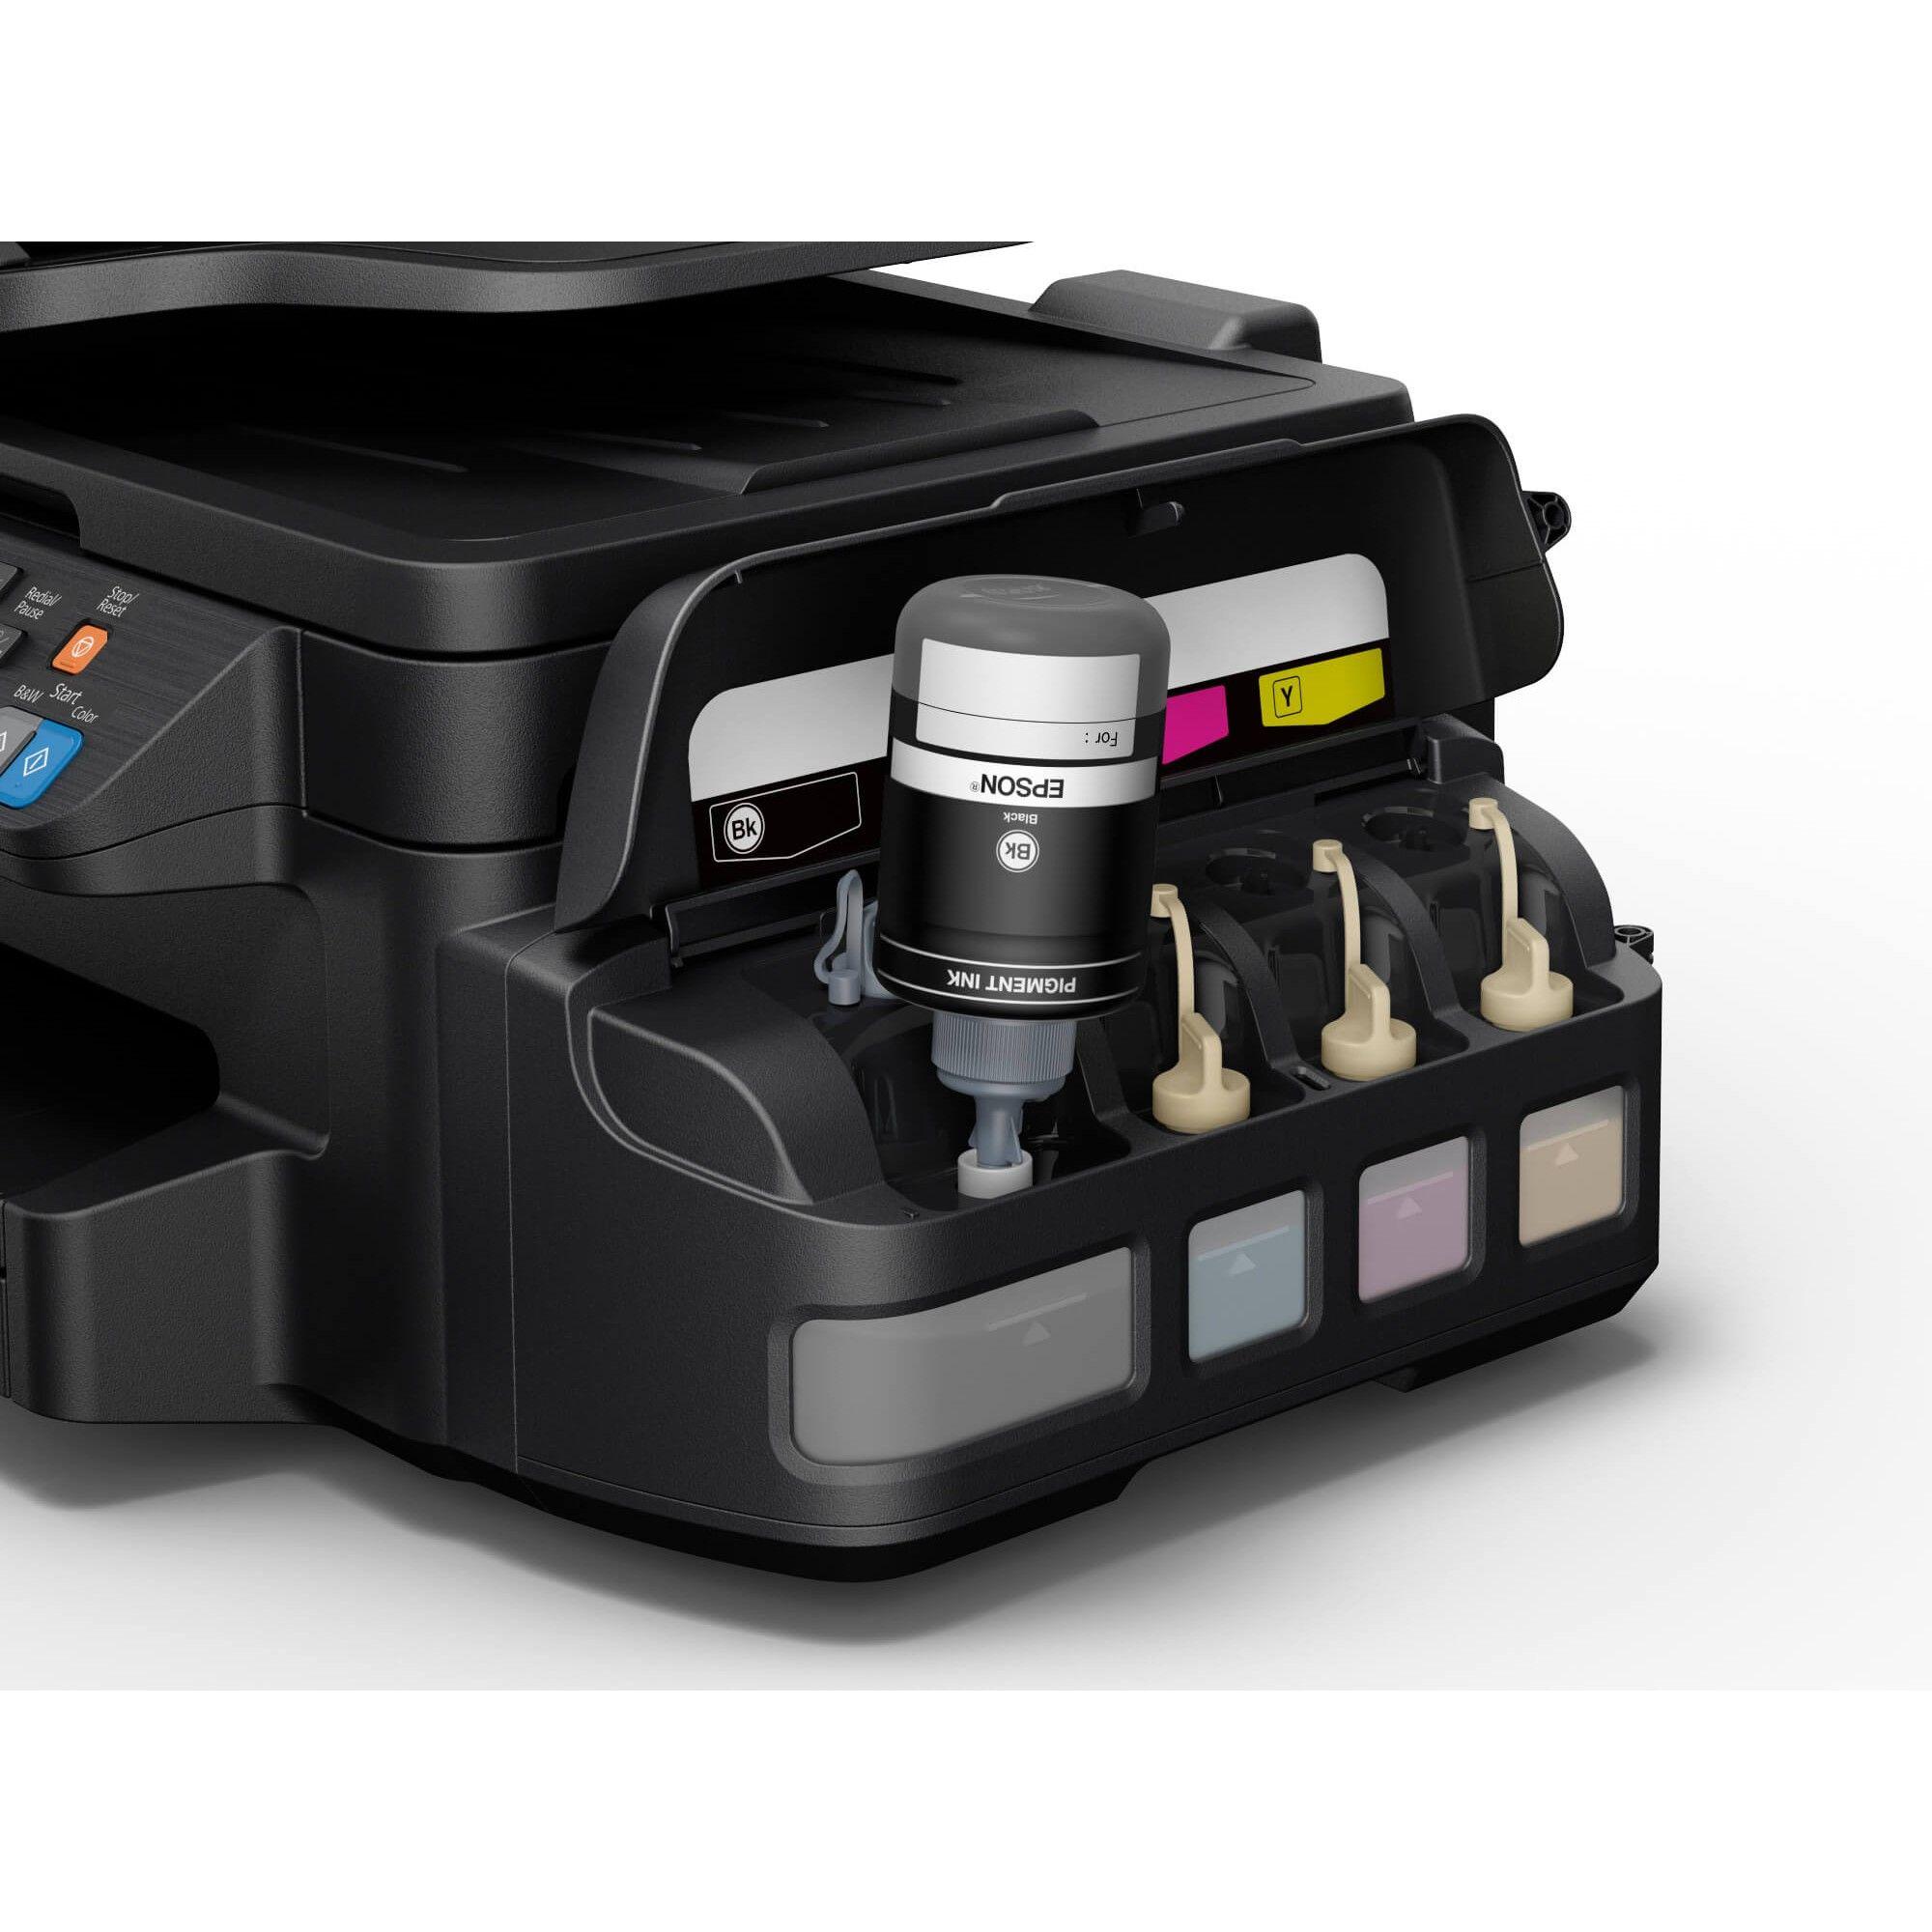 Multifuncional Epson Ecotank L656 Wireless | Duplex